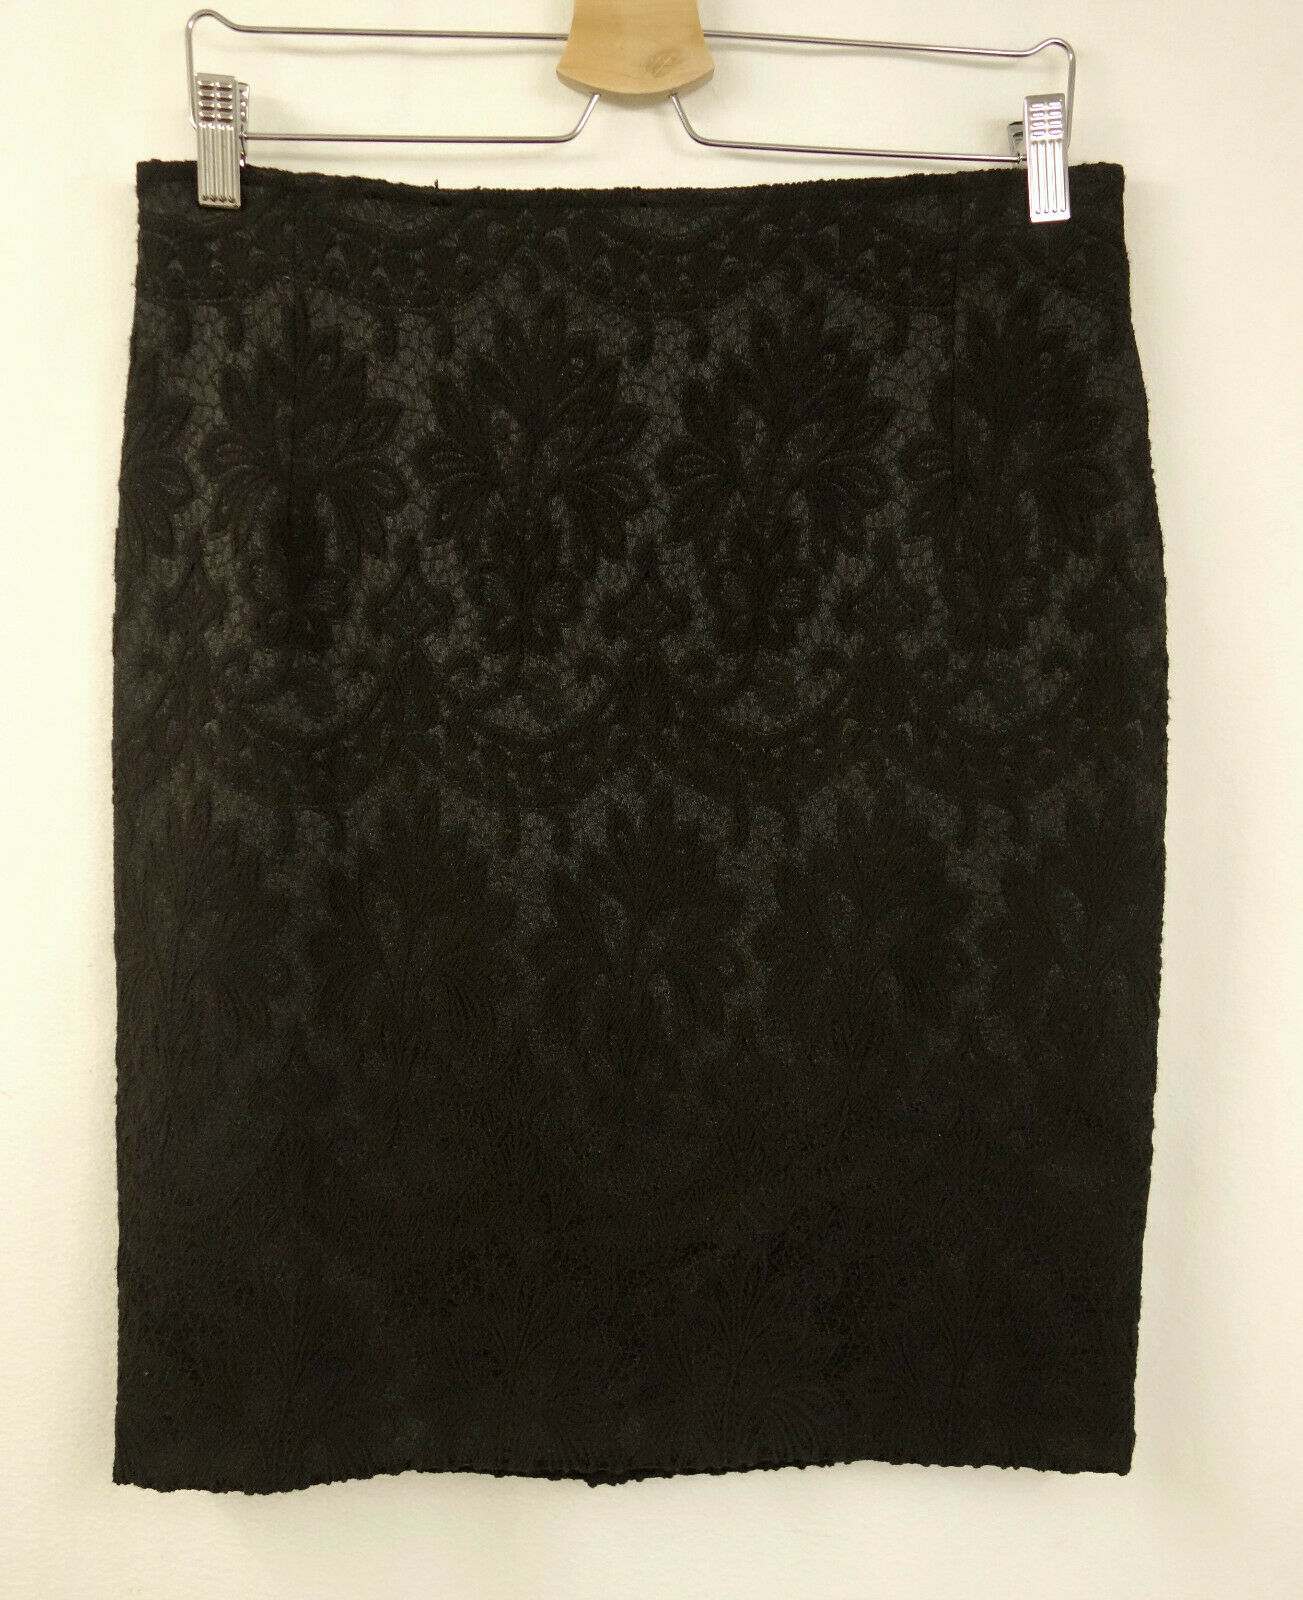 199 NEW Sem Per Lei Skirt Gr38 Skirt Pattern Lace Look Baroque Black